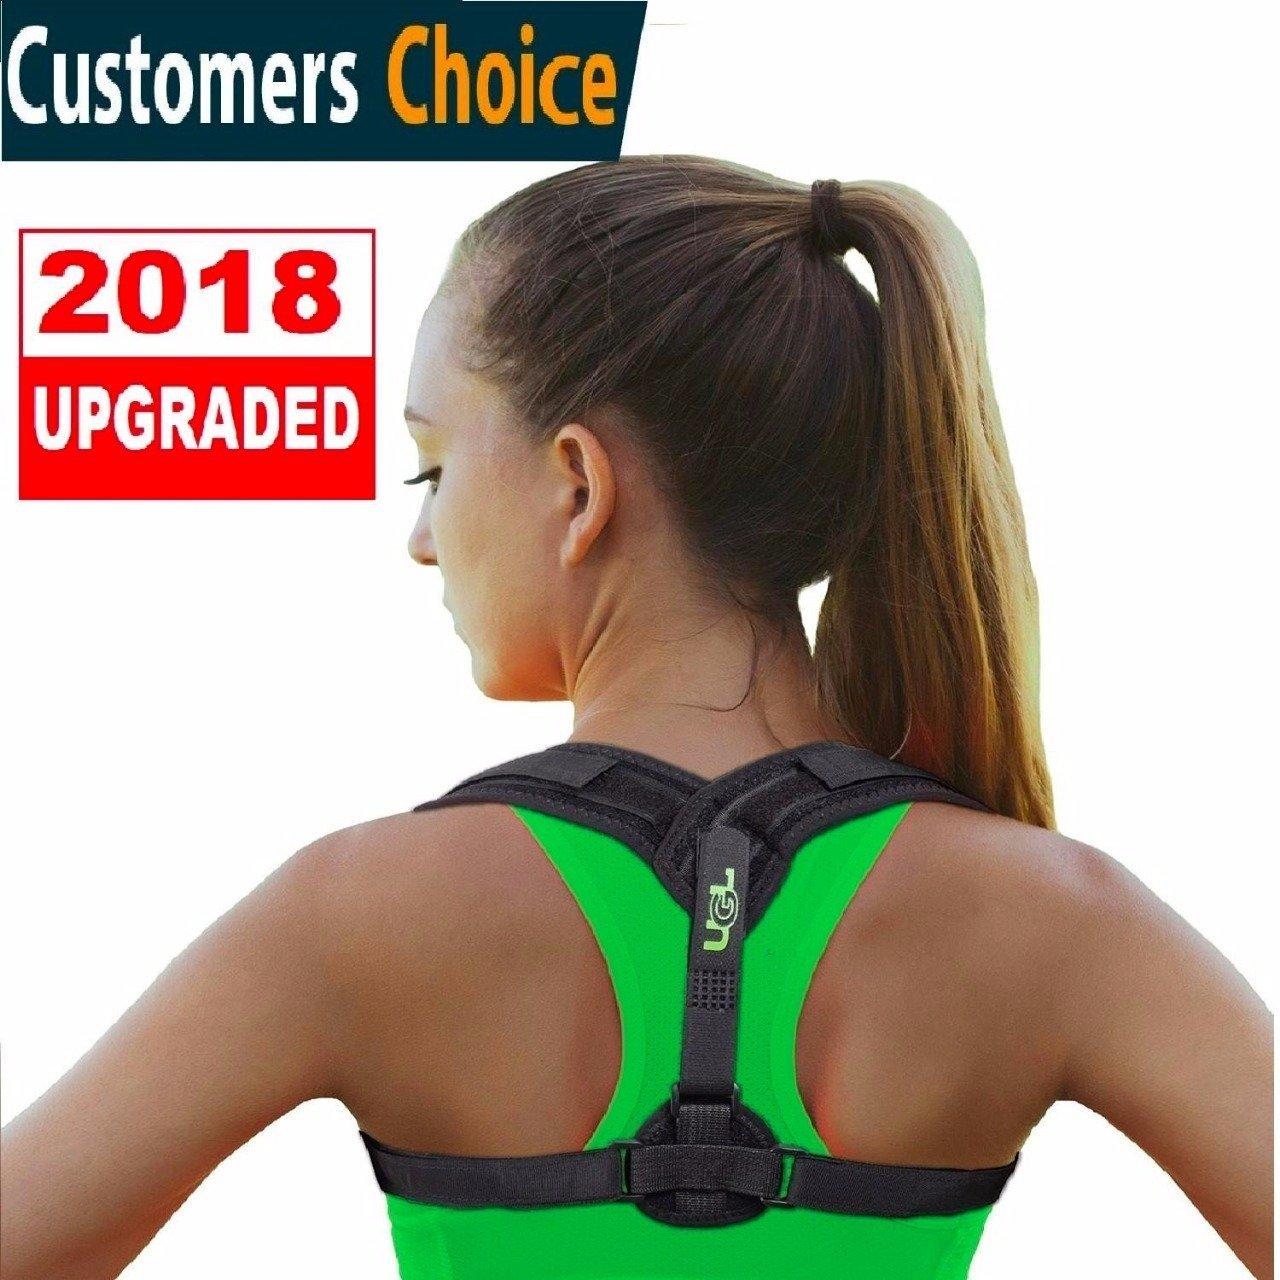 Back Brace Posture Corrector - Upper Back Posture Corrector for Women Men - Best Clavicle Support Sports Shoulder Straightener - Adjustable Comfortable Effective for Slouching Hunching Back Alignment